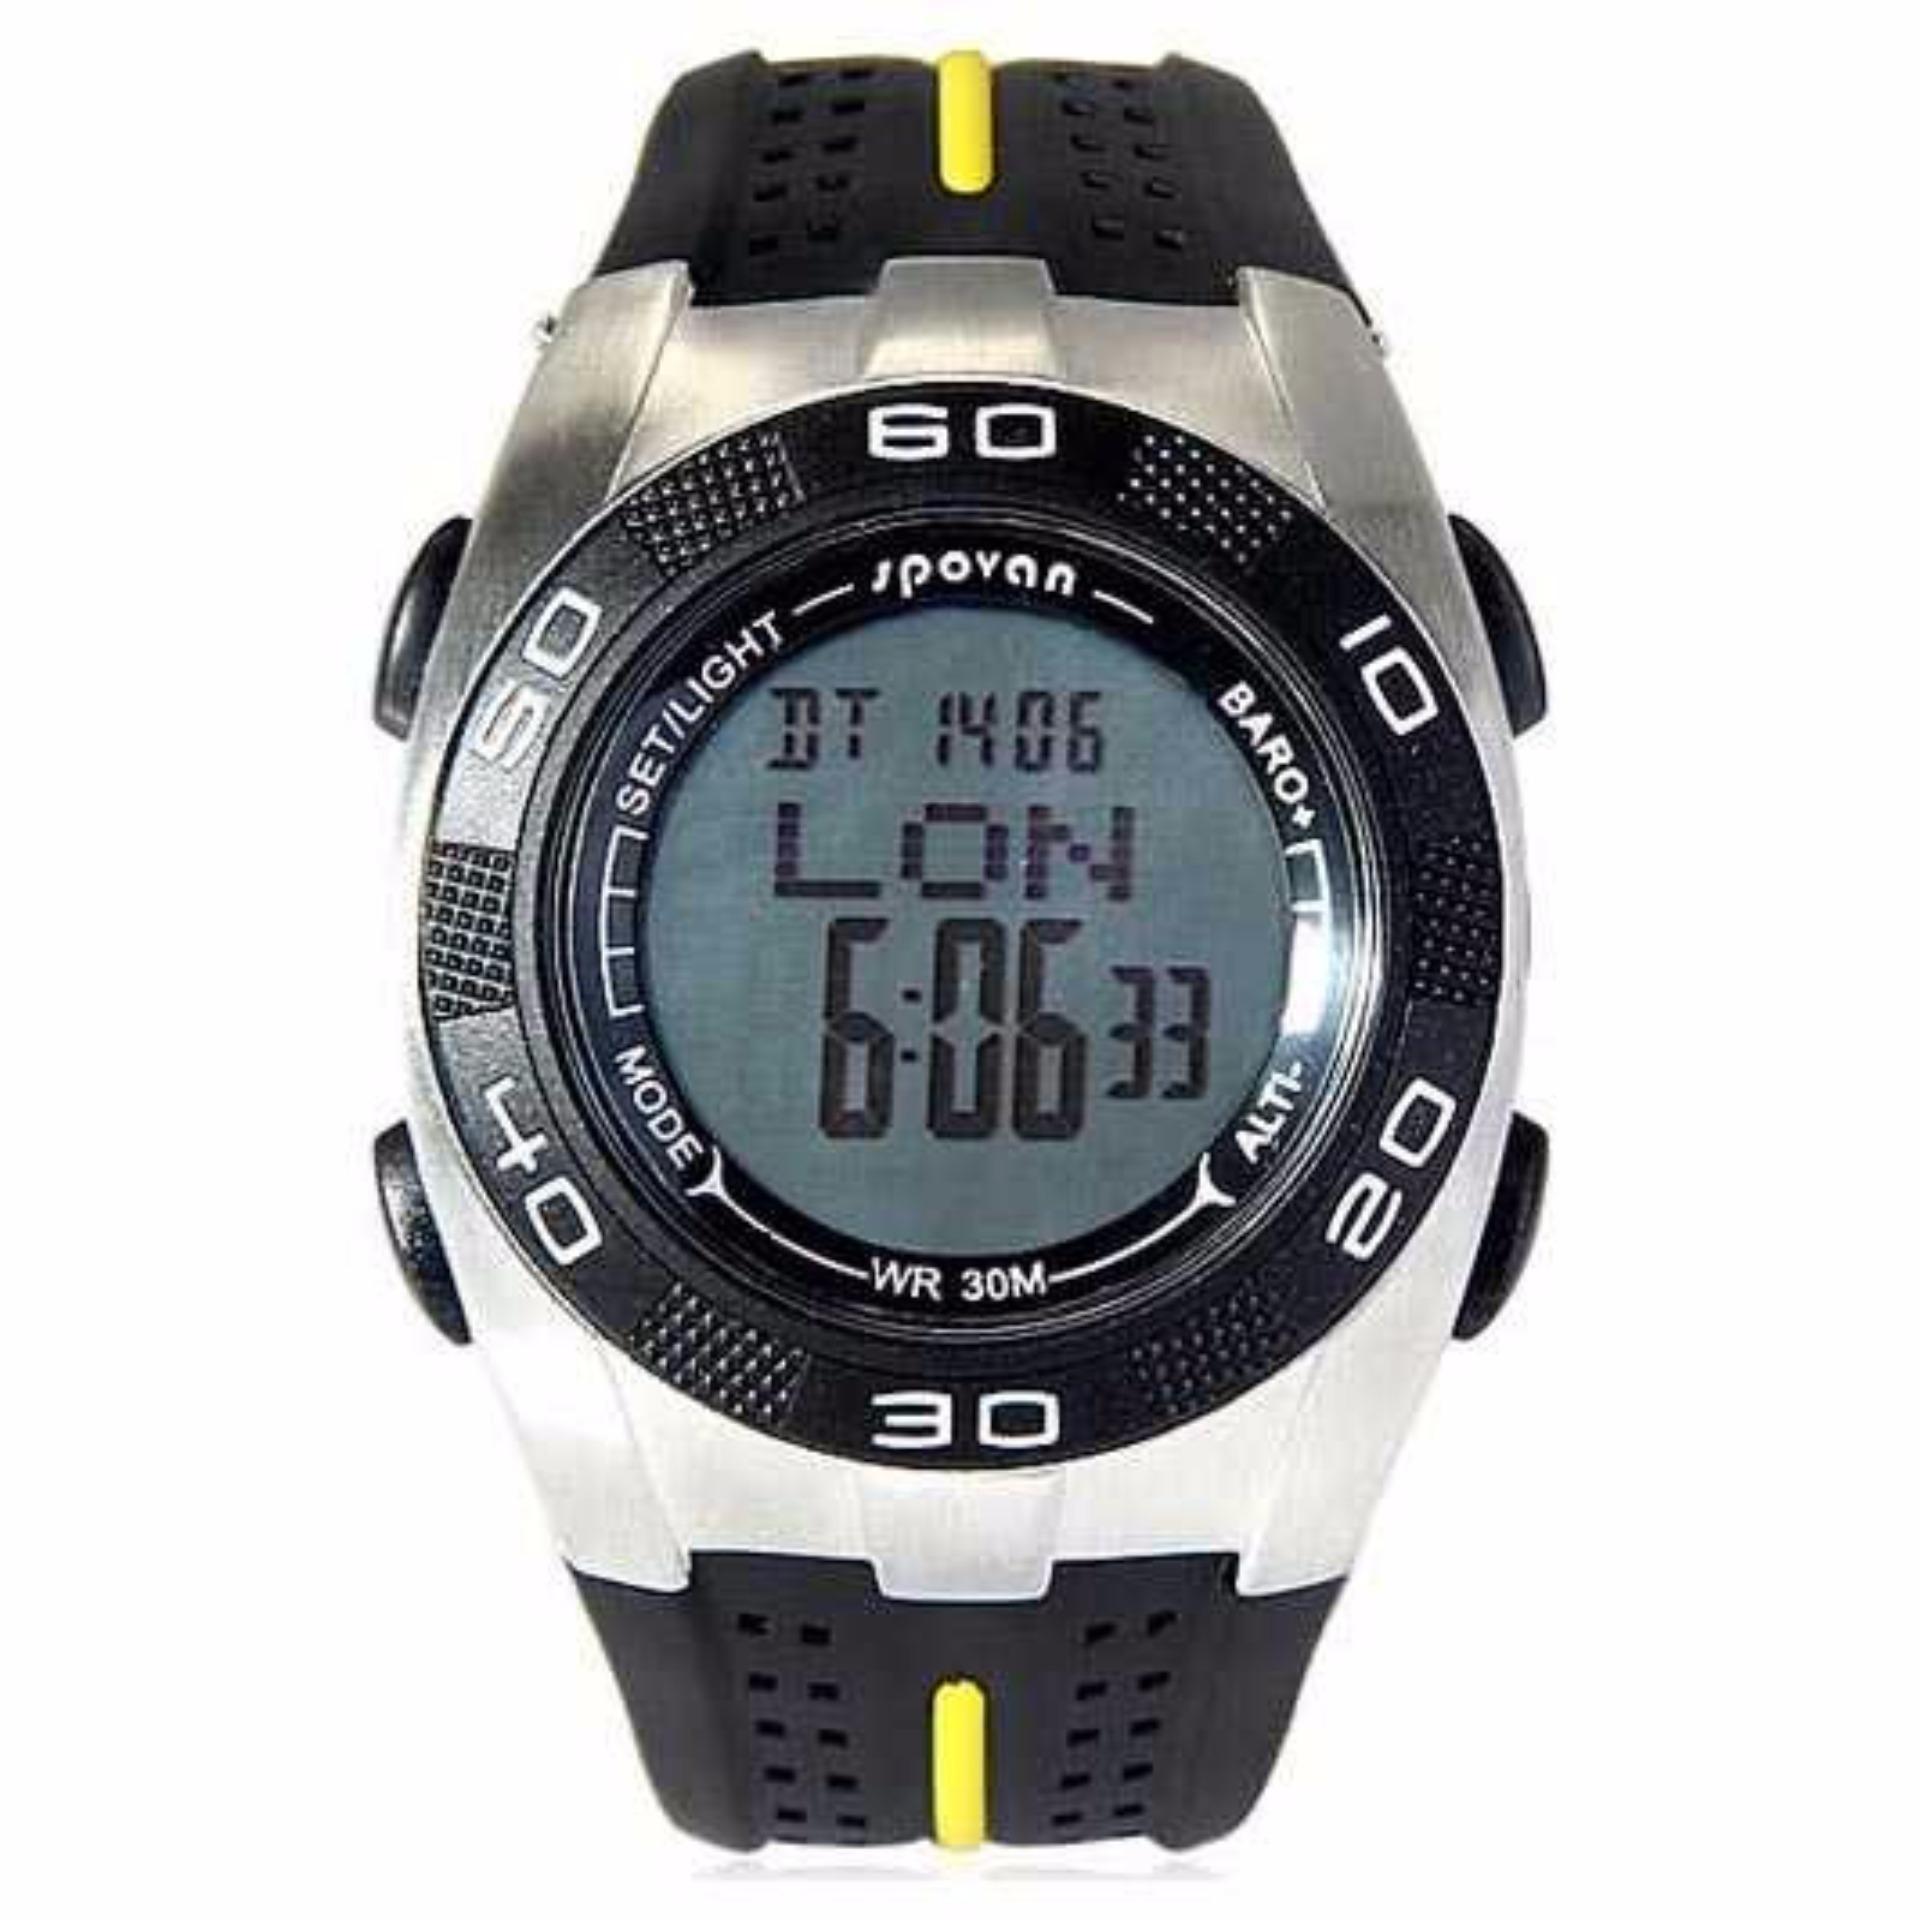 Outdoor Spovan Spv706 Fishing Barometer For Traveling Jam Bravo Ii Tangan Sport Black Blade V Waterproof Watch White